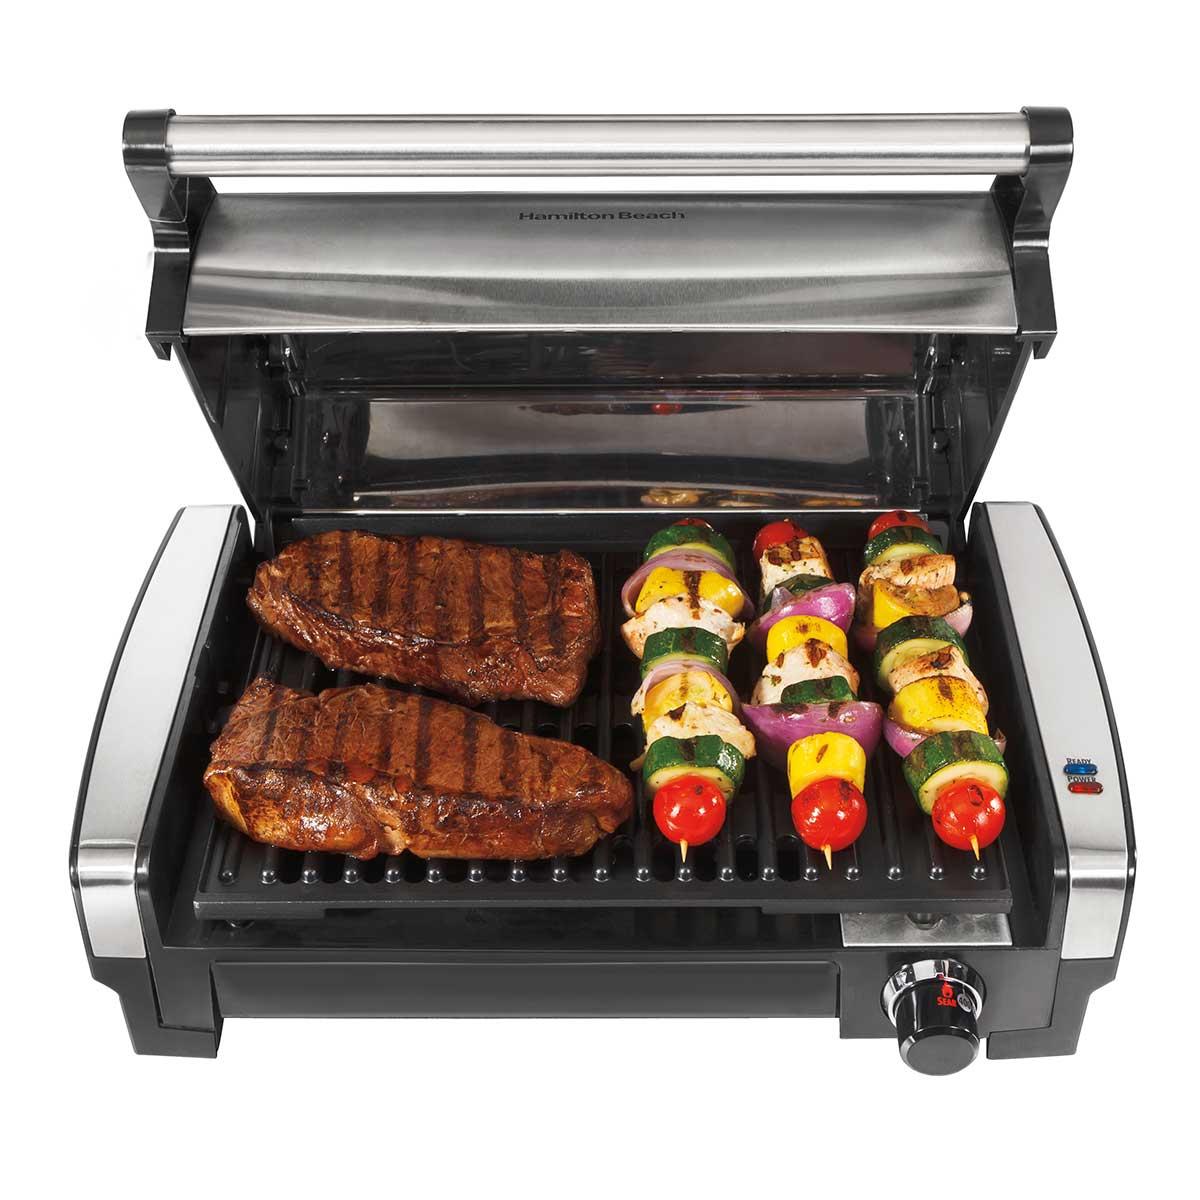 The grill fashion cuisine 69